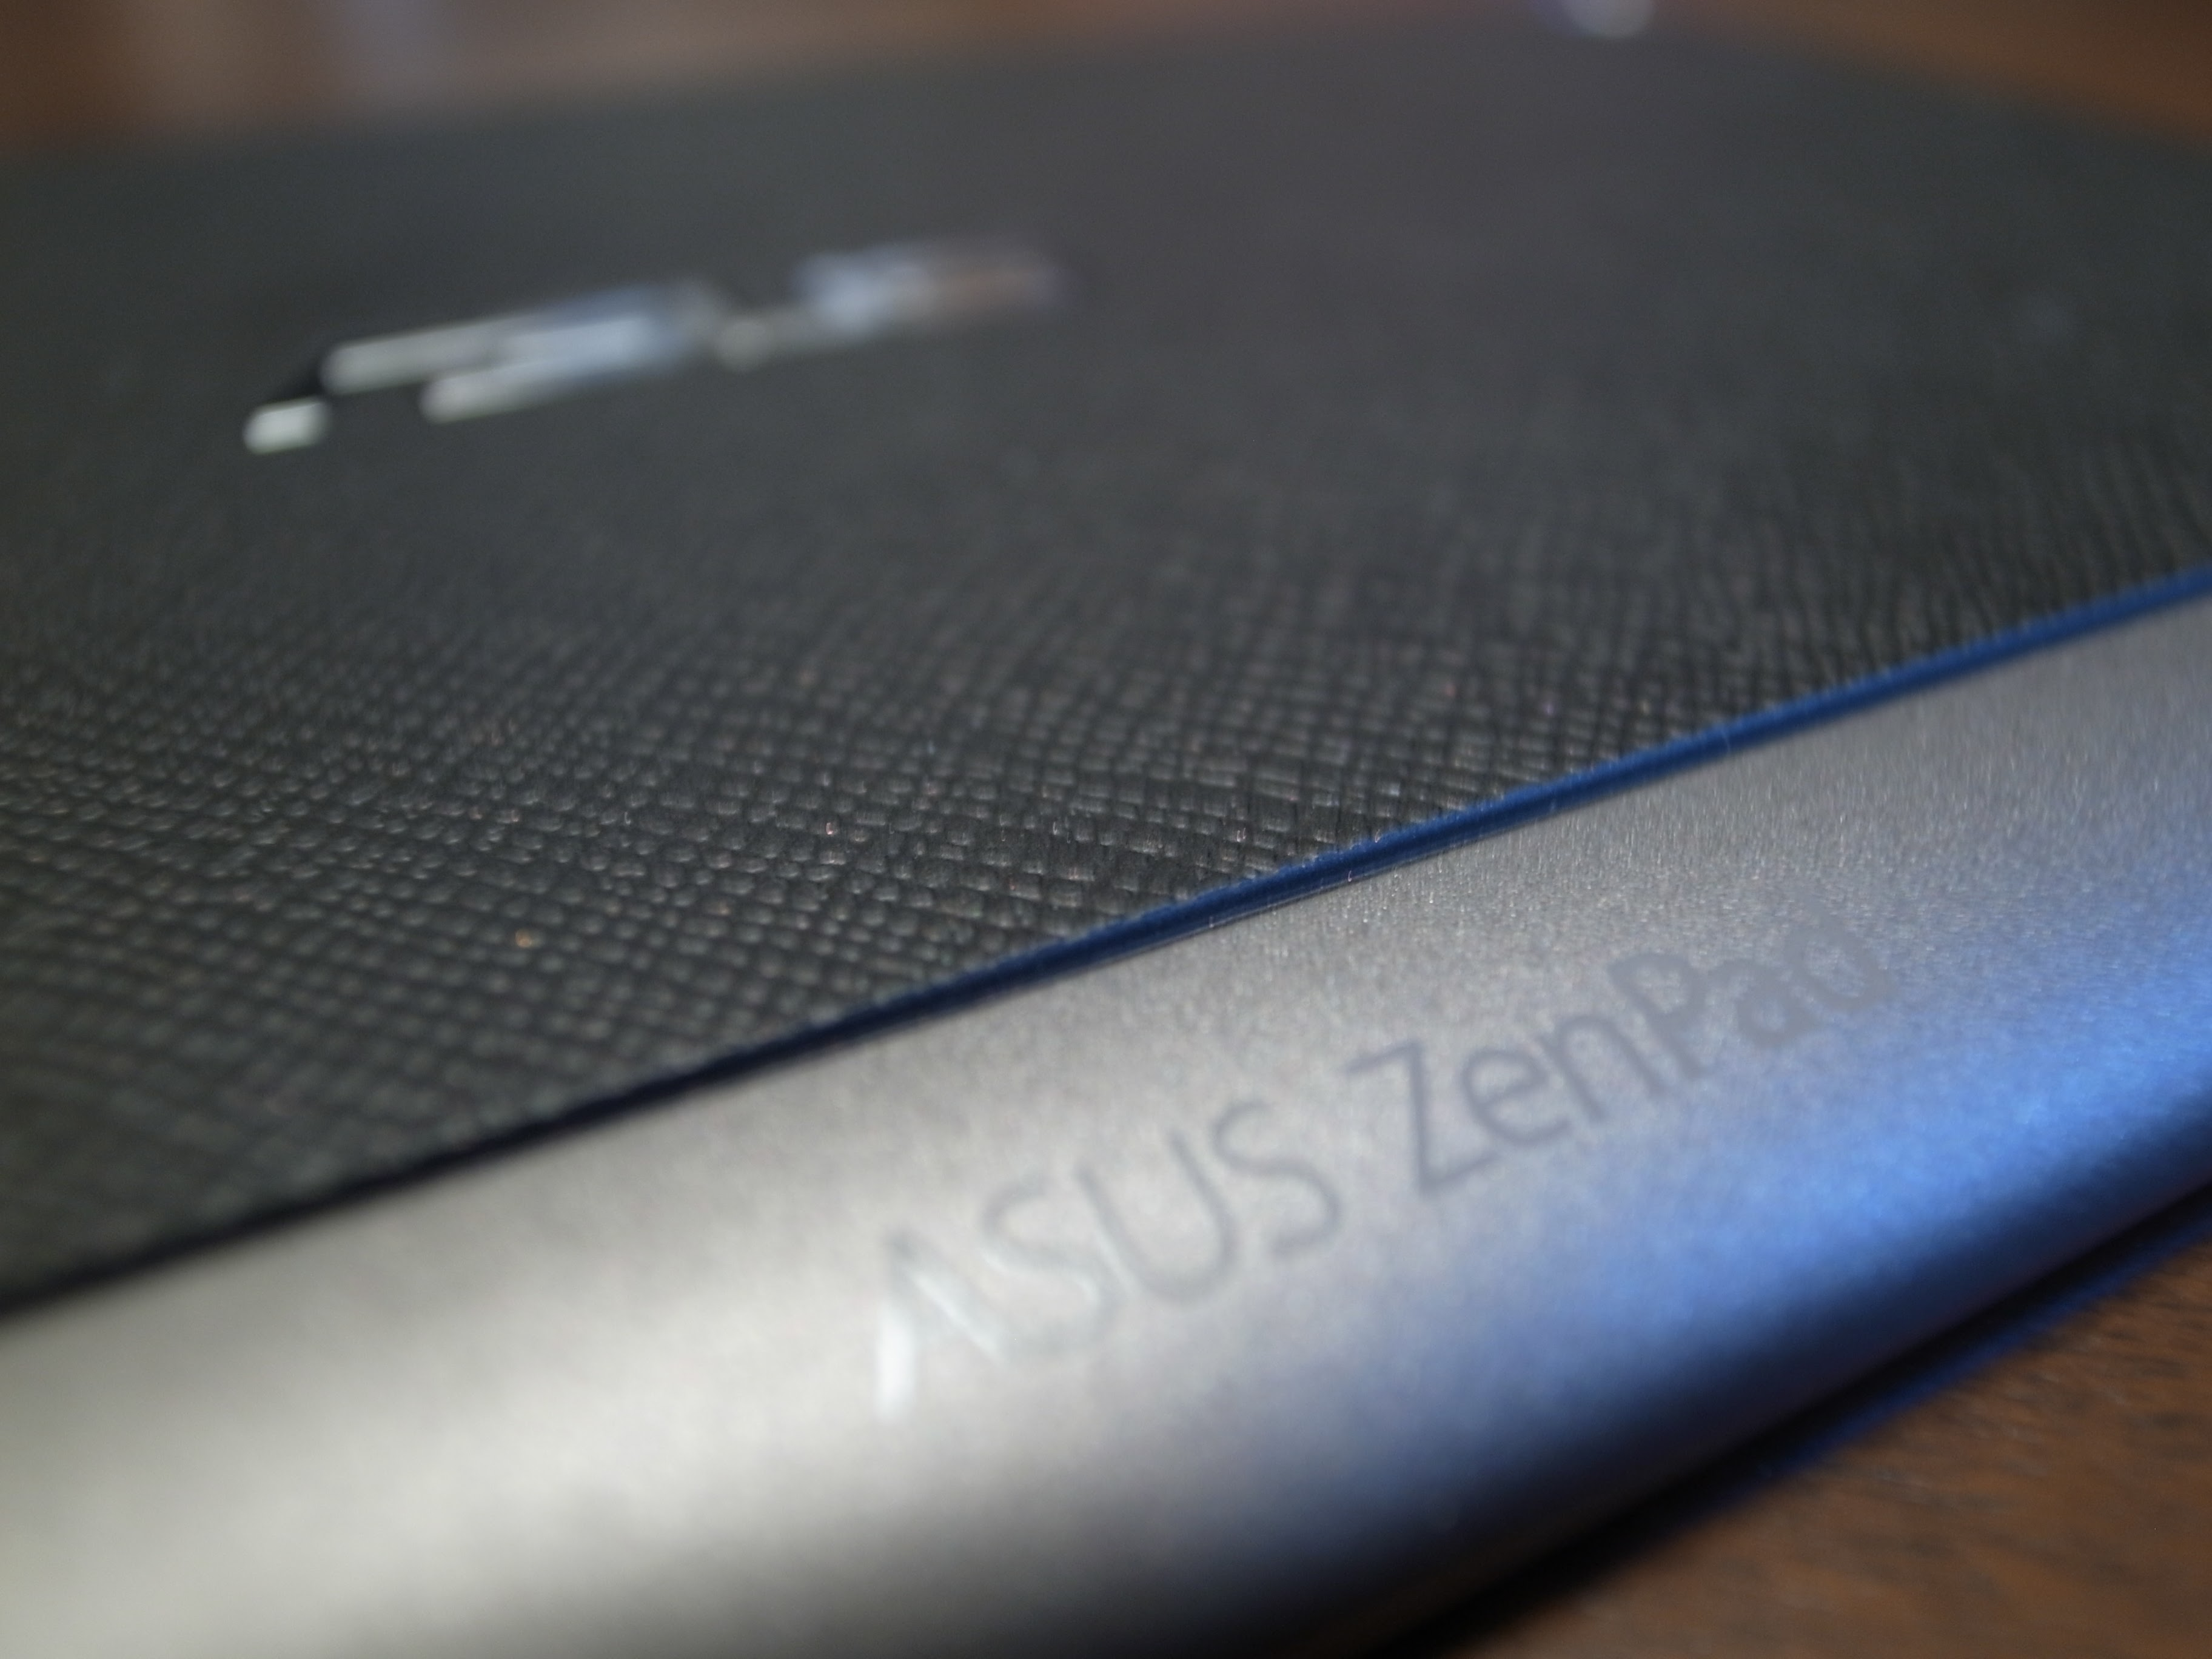 1005-201508_ASUS ZenPad Z370C 11